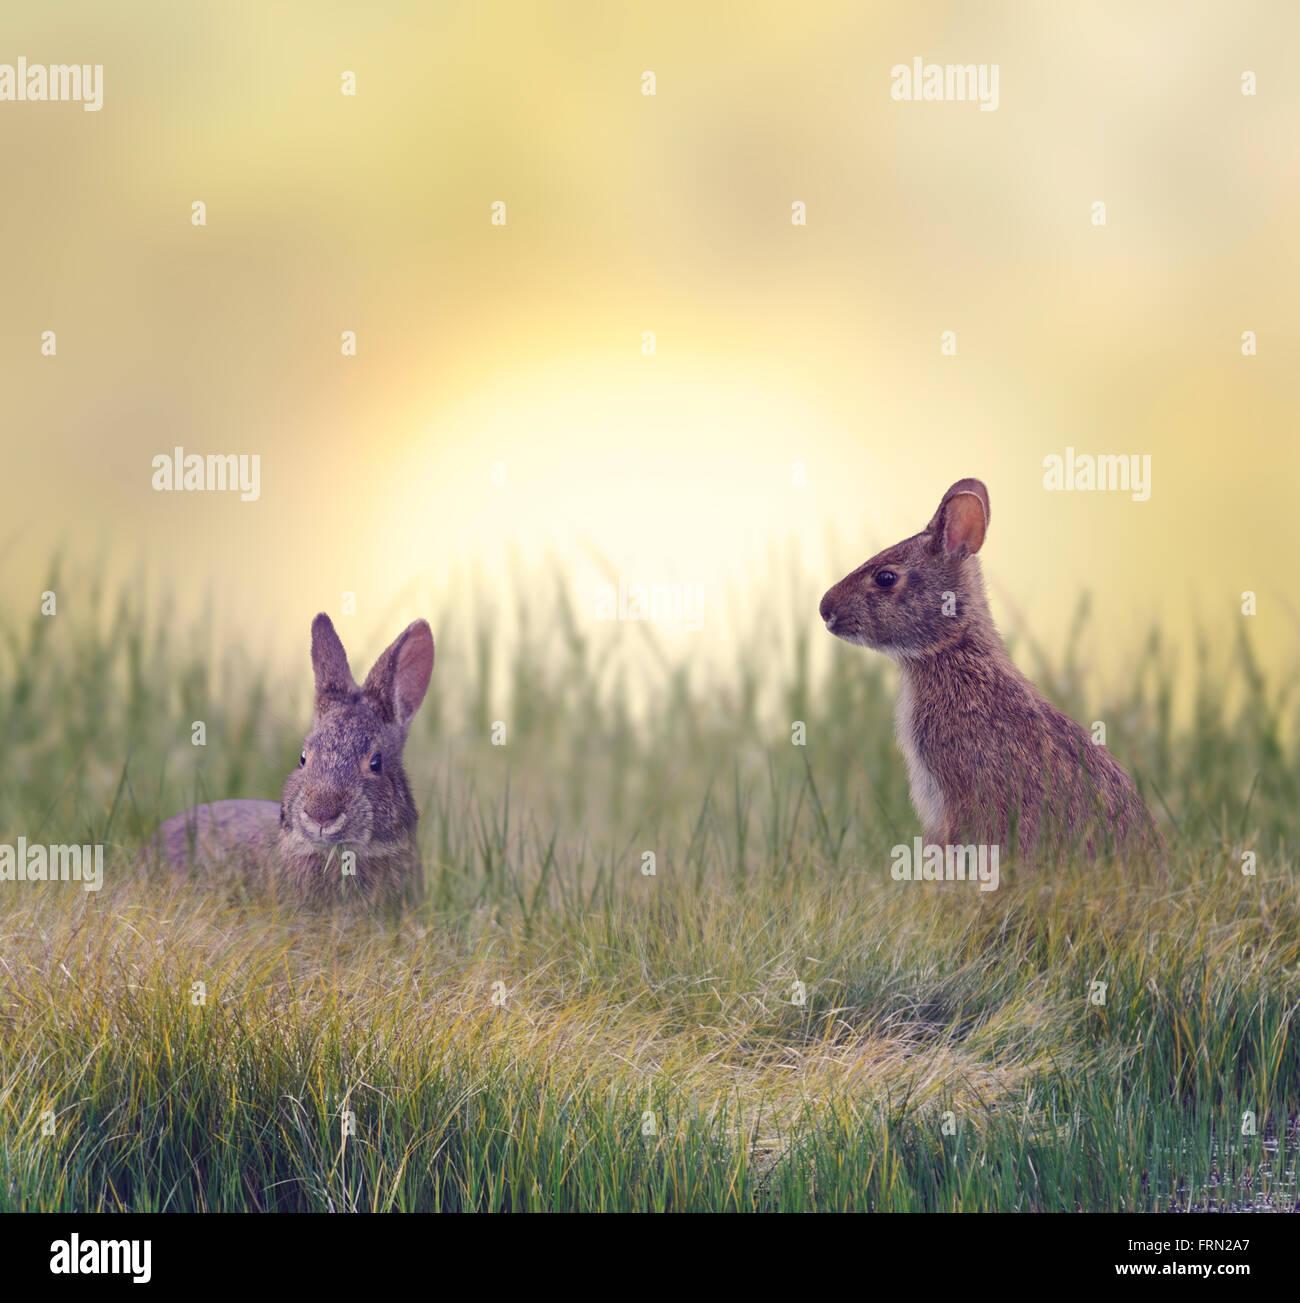 Marsh Rabbits Eating Green Grass - Stock Image